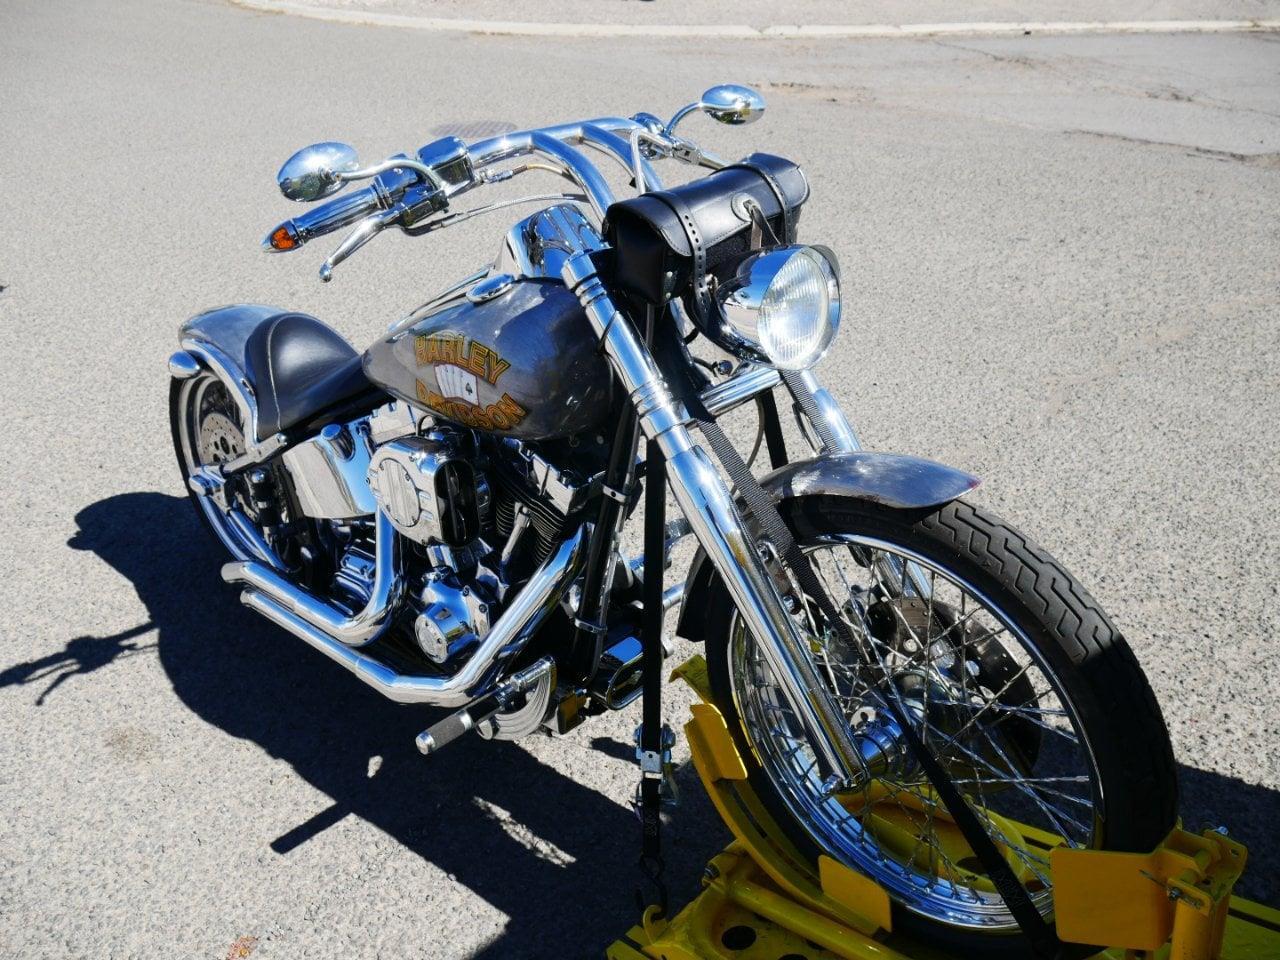 2001 Harley-Davidson Motorcycle (CC-1338436) for sale in Reno, Nevada